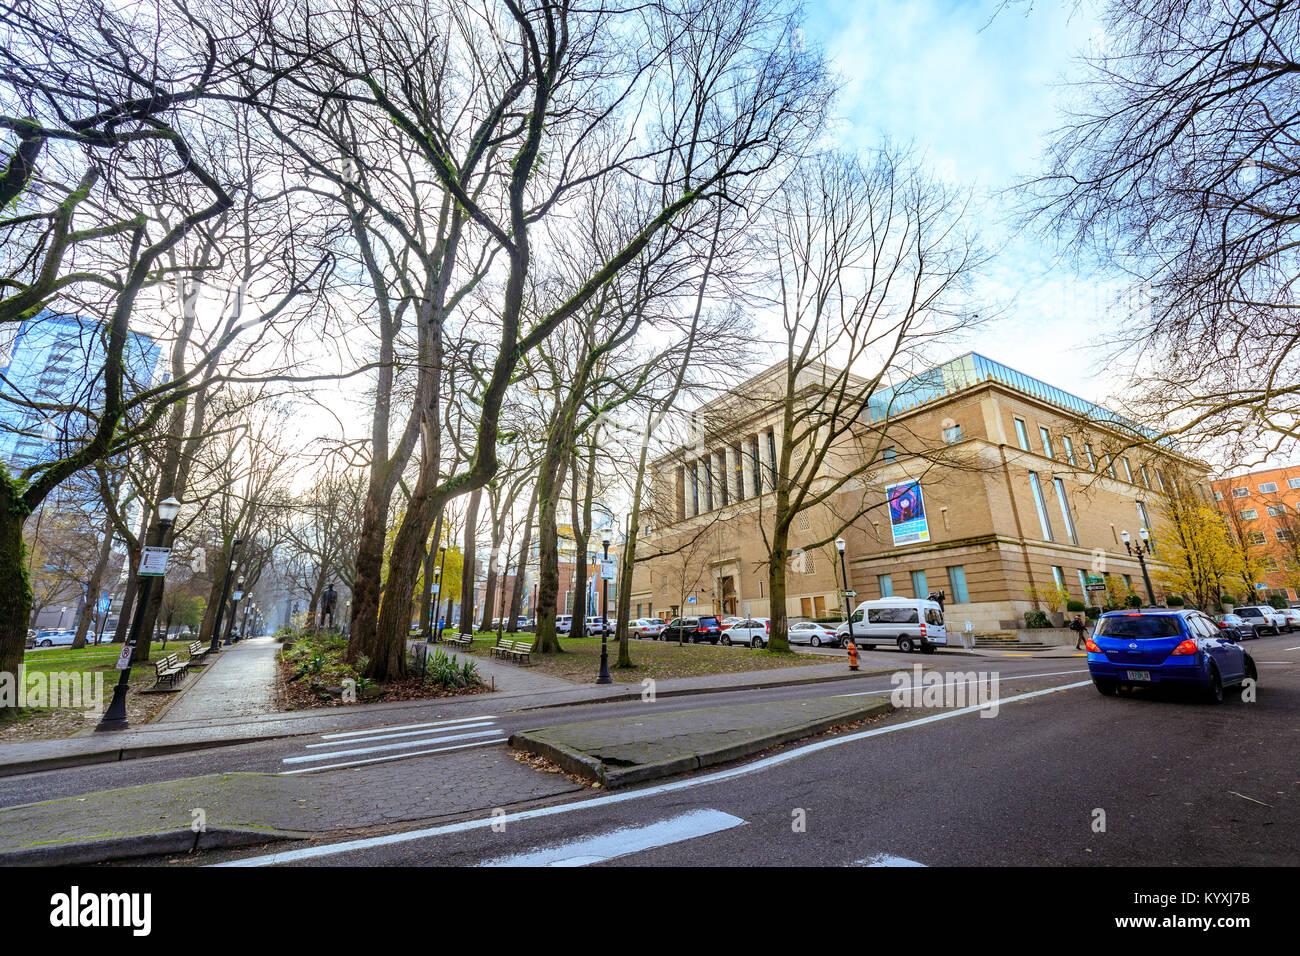 Portland, Oregon, United States - Dec 22, 2017 : Facade of the landmark Portland Art Museum. It is the oldest art museum on the West Coast of the Unit Stock Photo